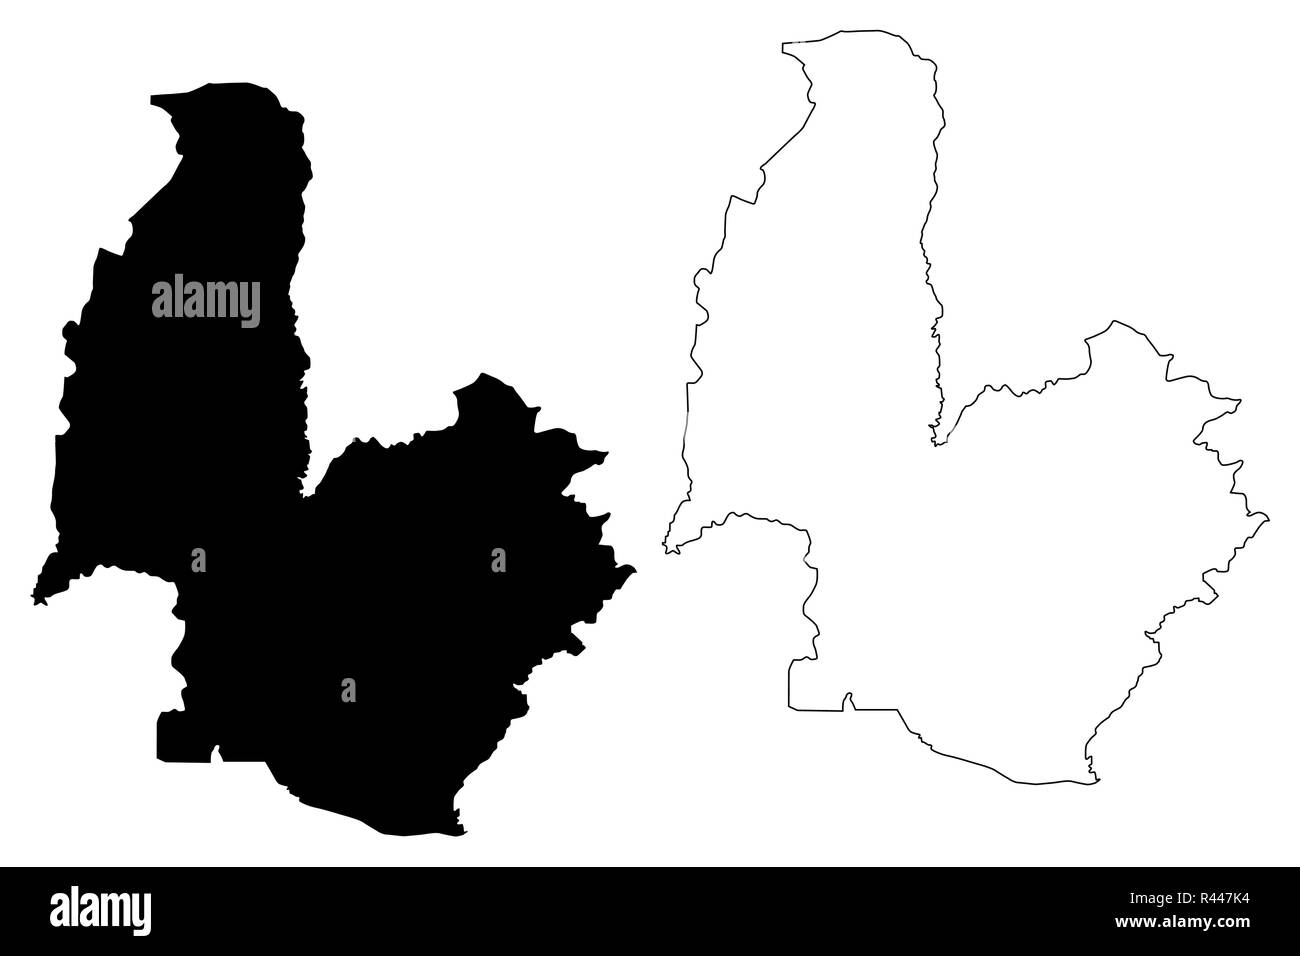 Osmaniye (Provinces of the Republic of Turkey) map vector illustration, scribble sketch Osmaniye ili map - Stock Image